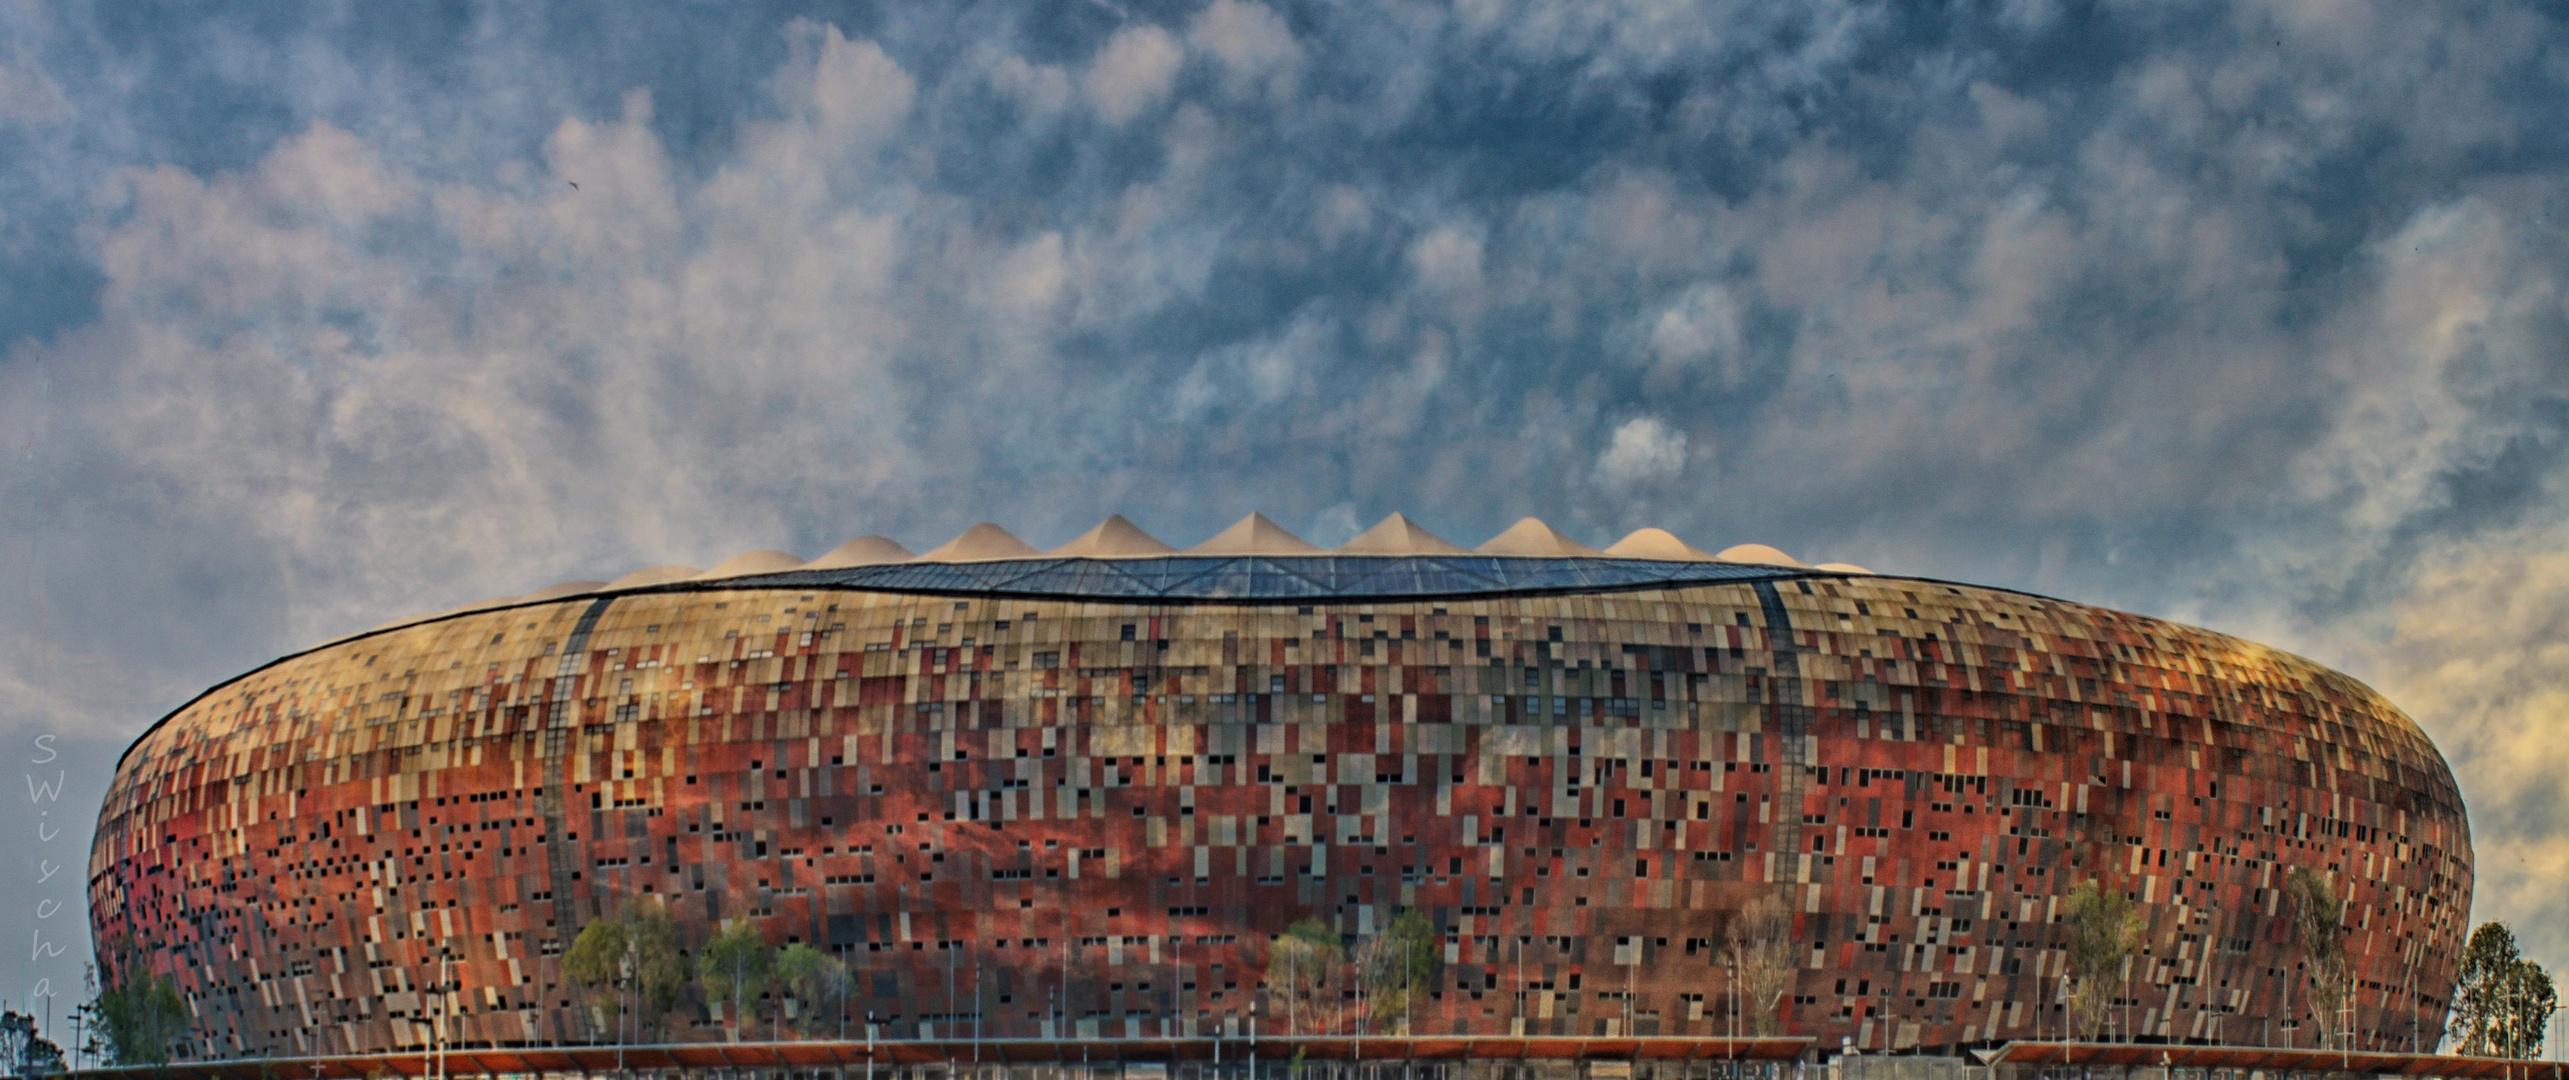 Soccer City Stadion South Africa / Johburg